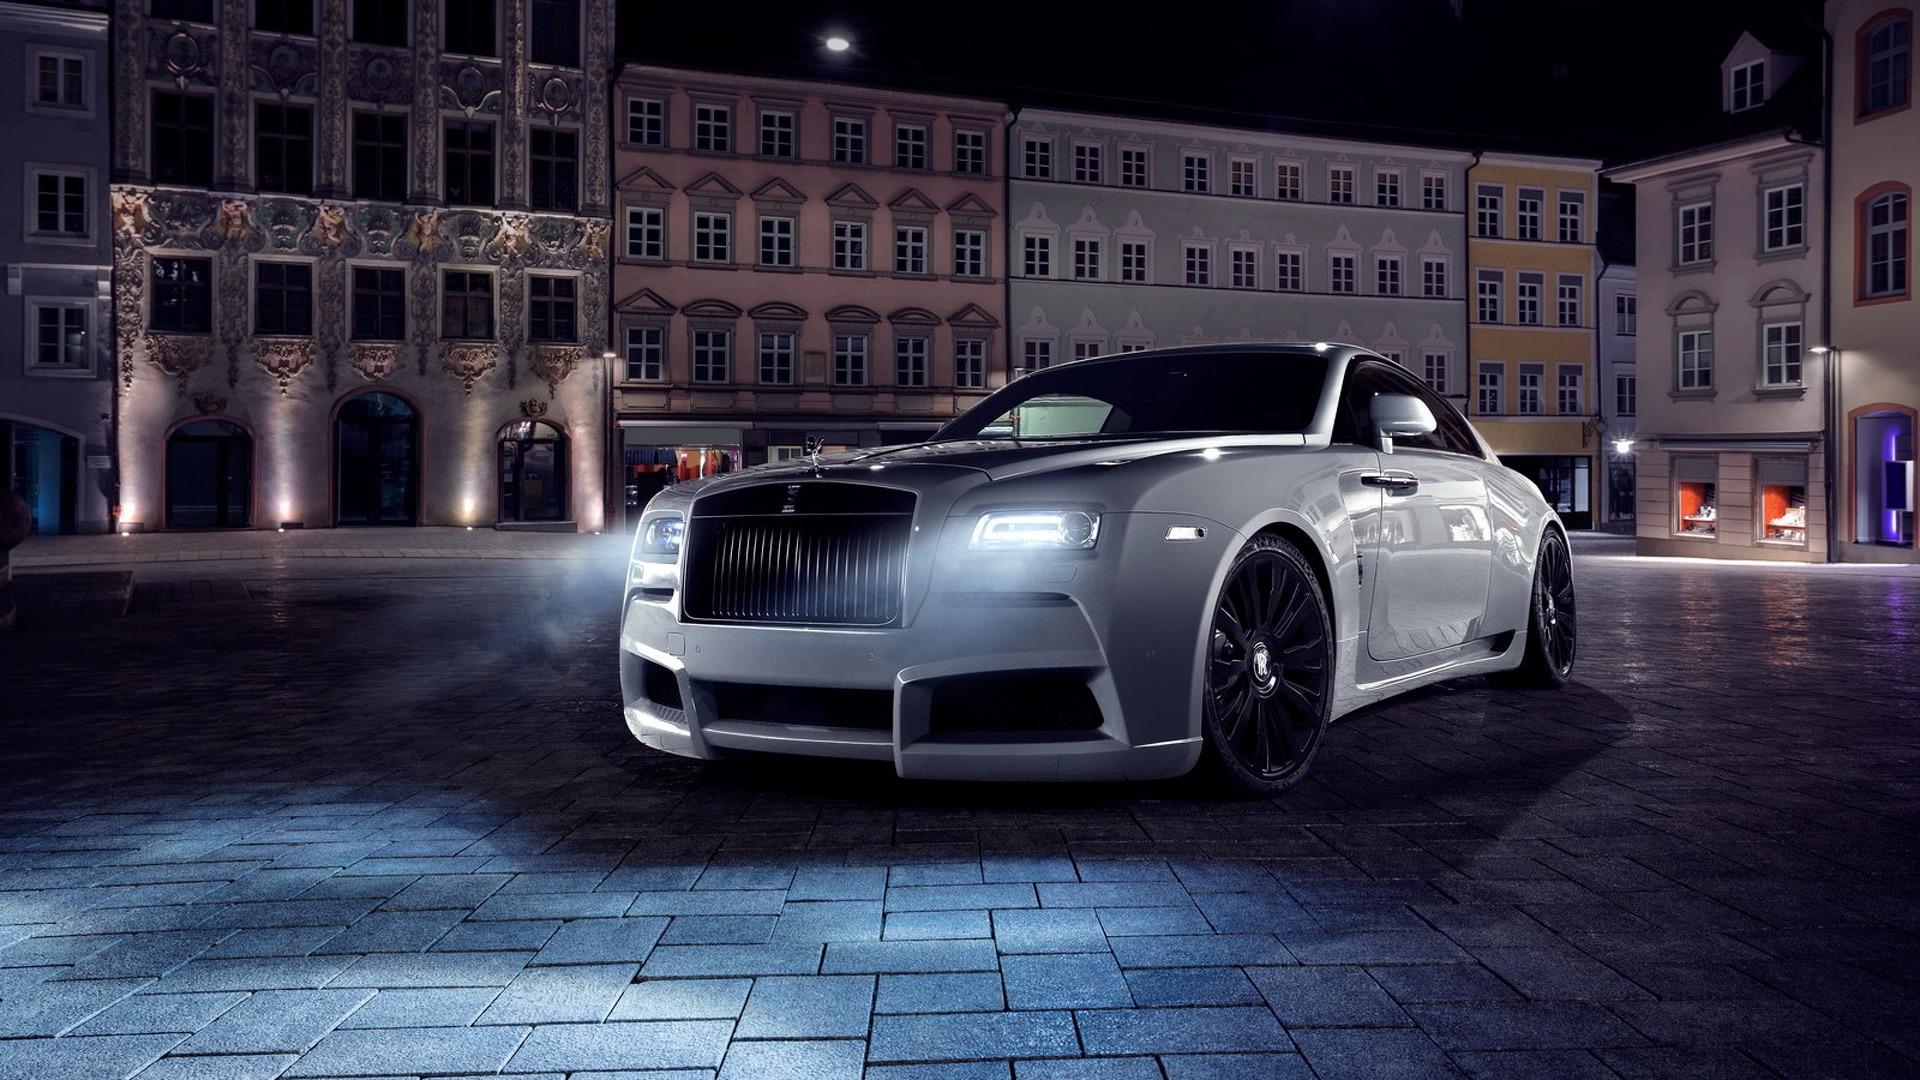 717-hp Rolls-Royce Wraith gets tuner wide body